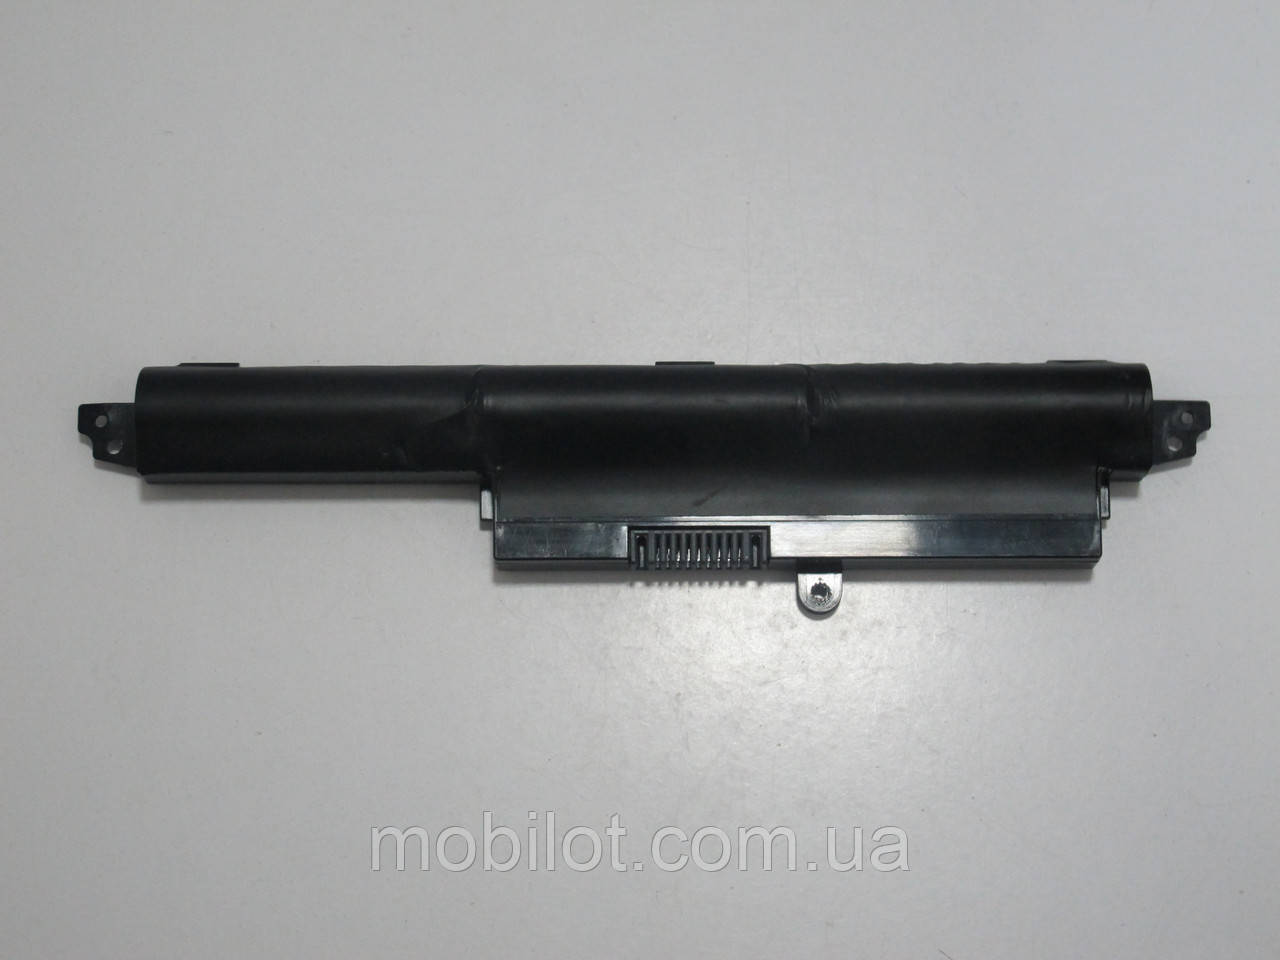 Аккумуляторная батарея Asus X200 (NZA-4881)